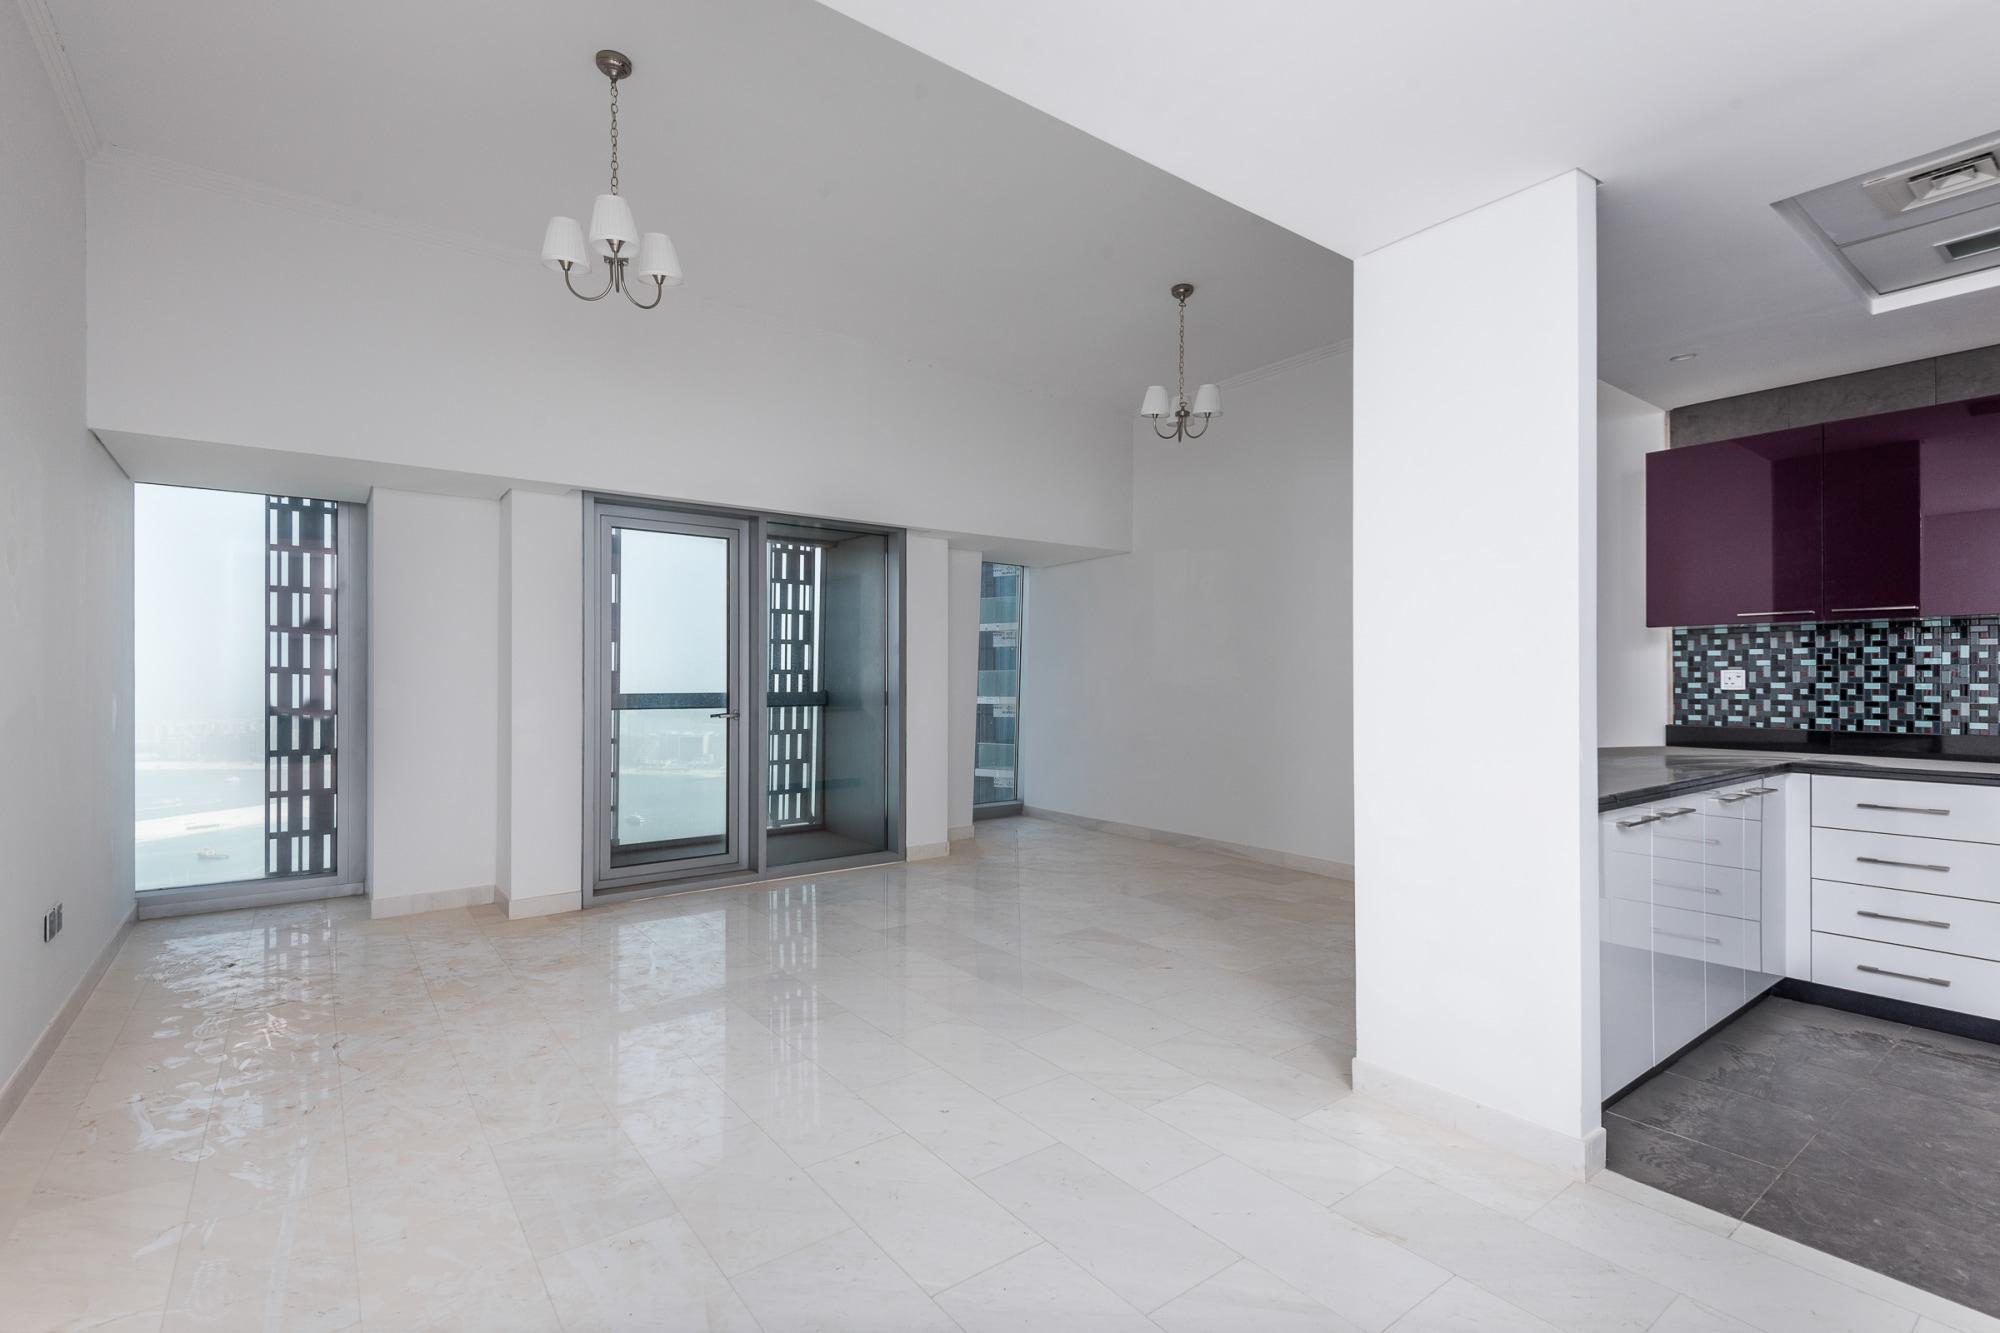 2 Bedroom | High Floor with Full Sea View